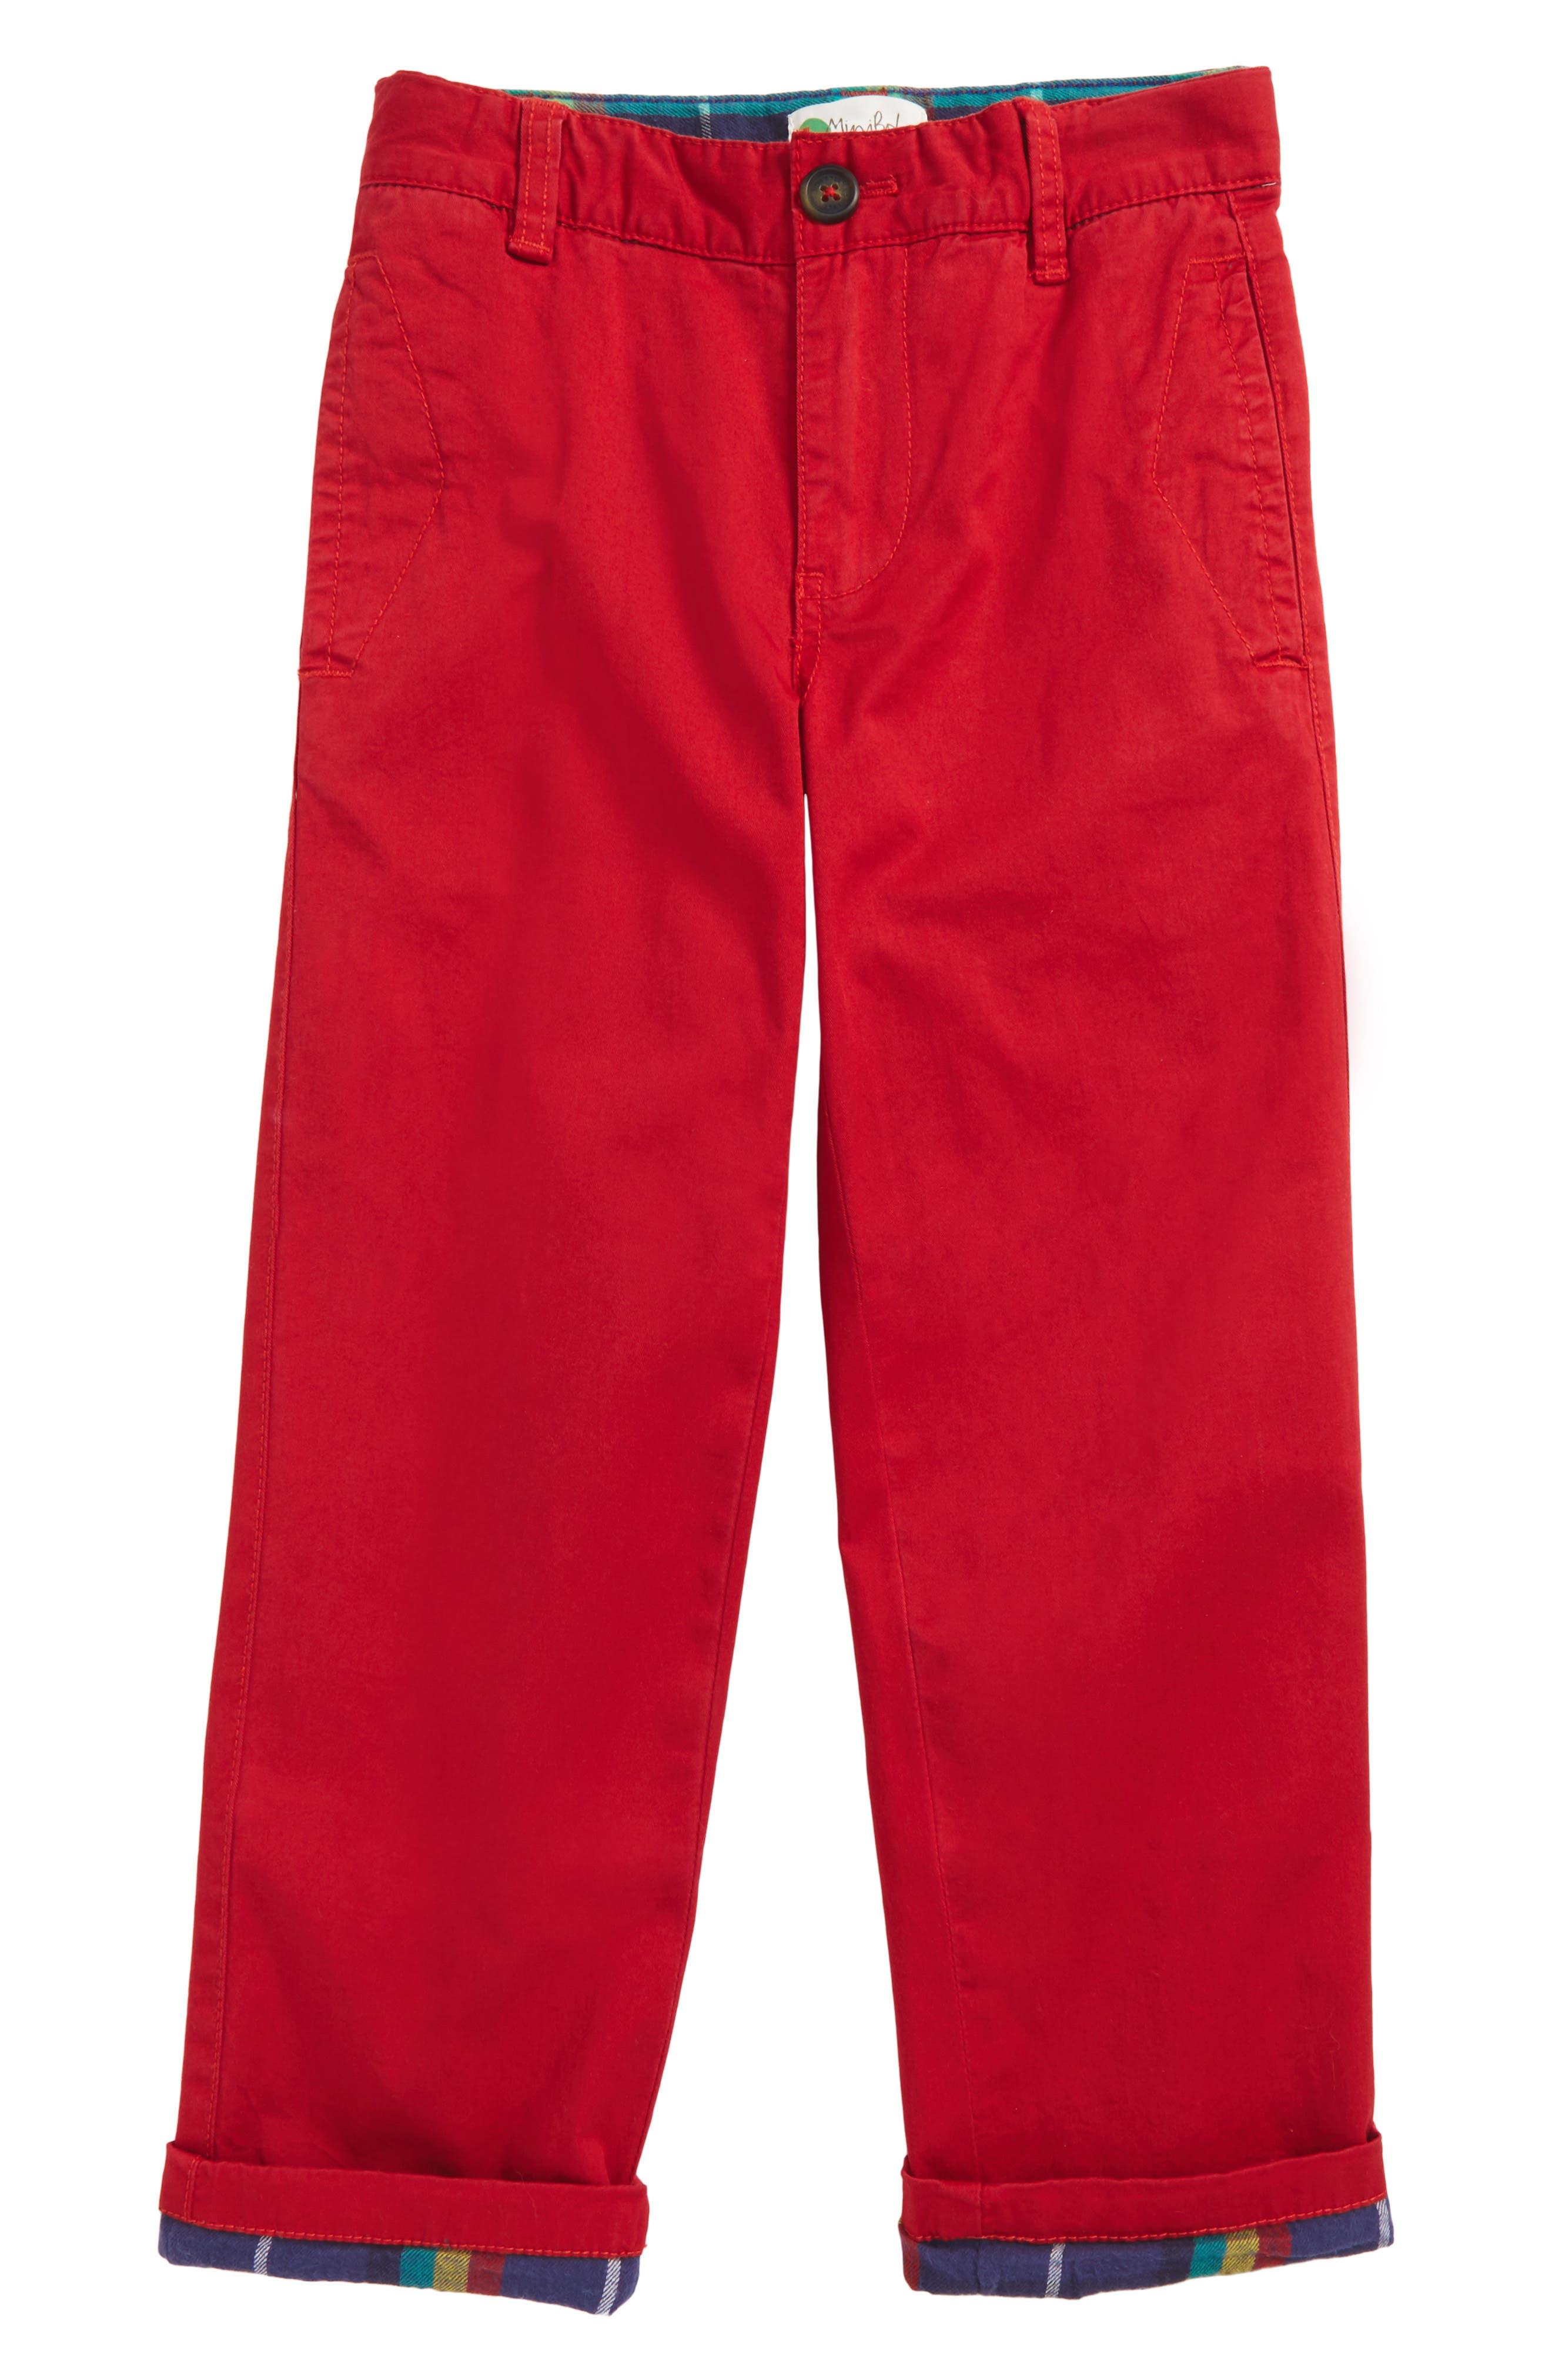 Boys Red Corduroy Pants uxlo6fuD